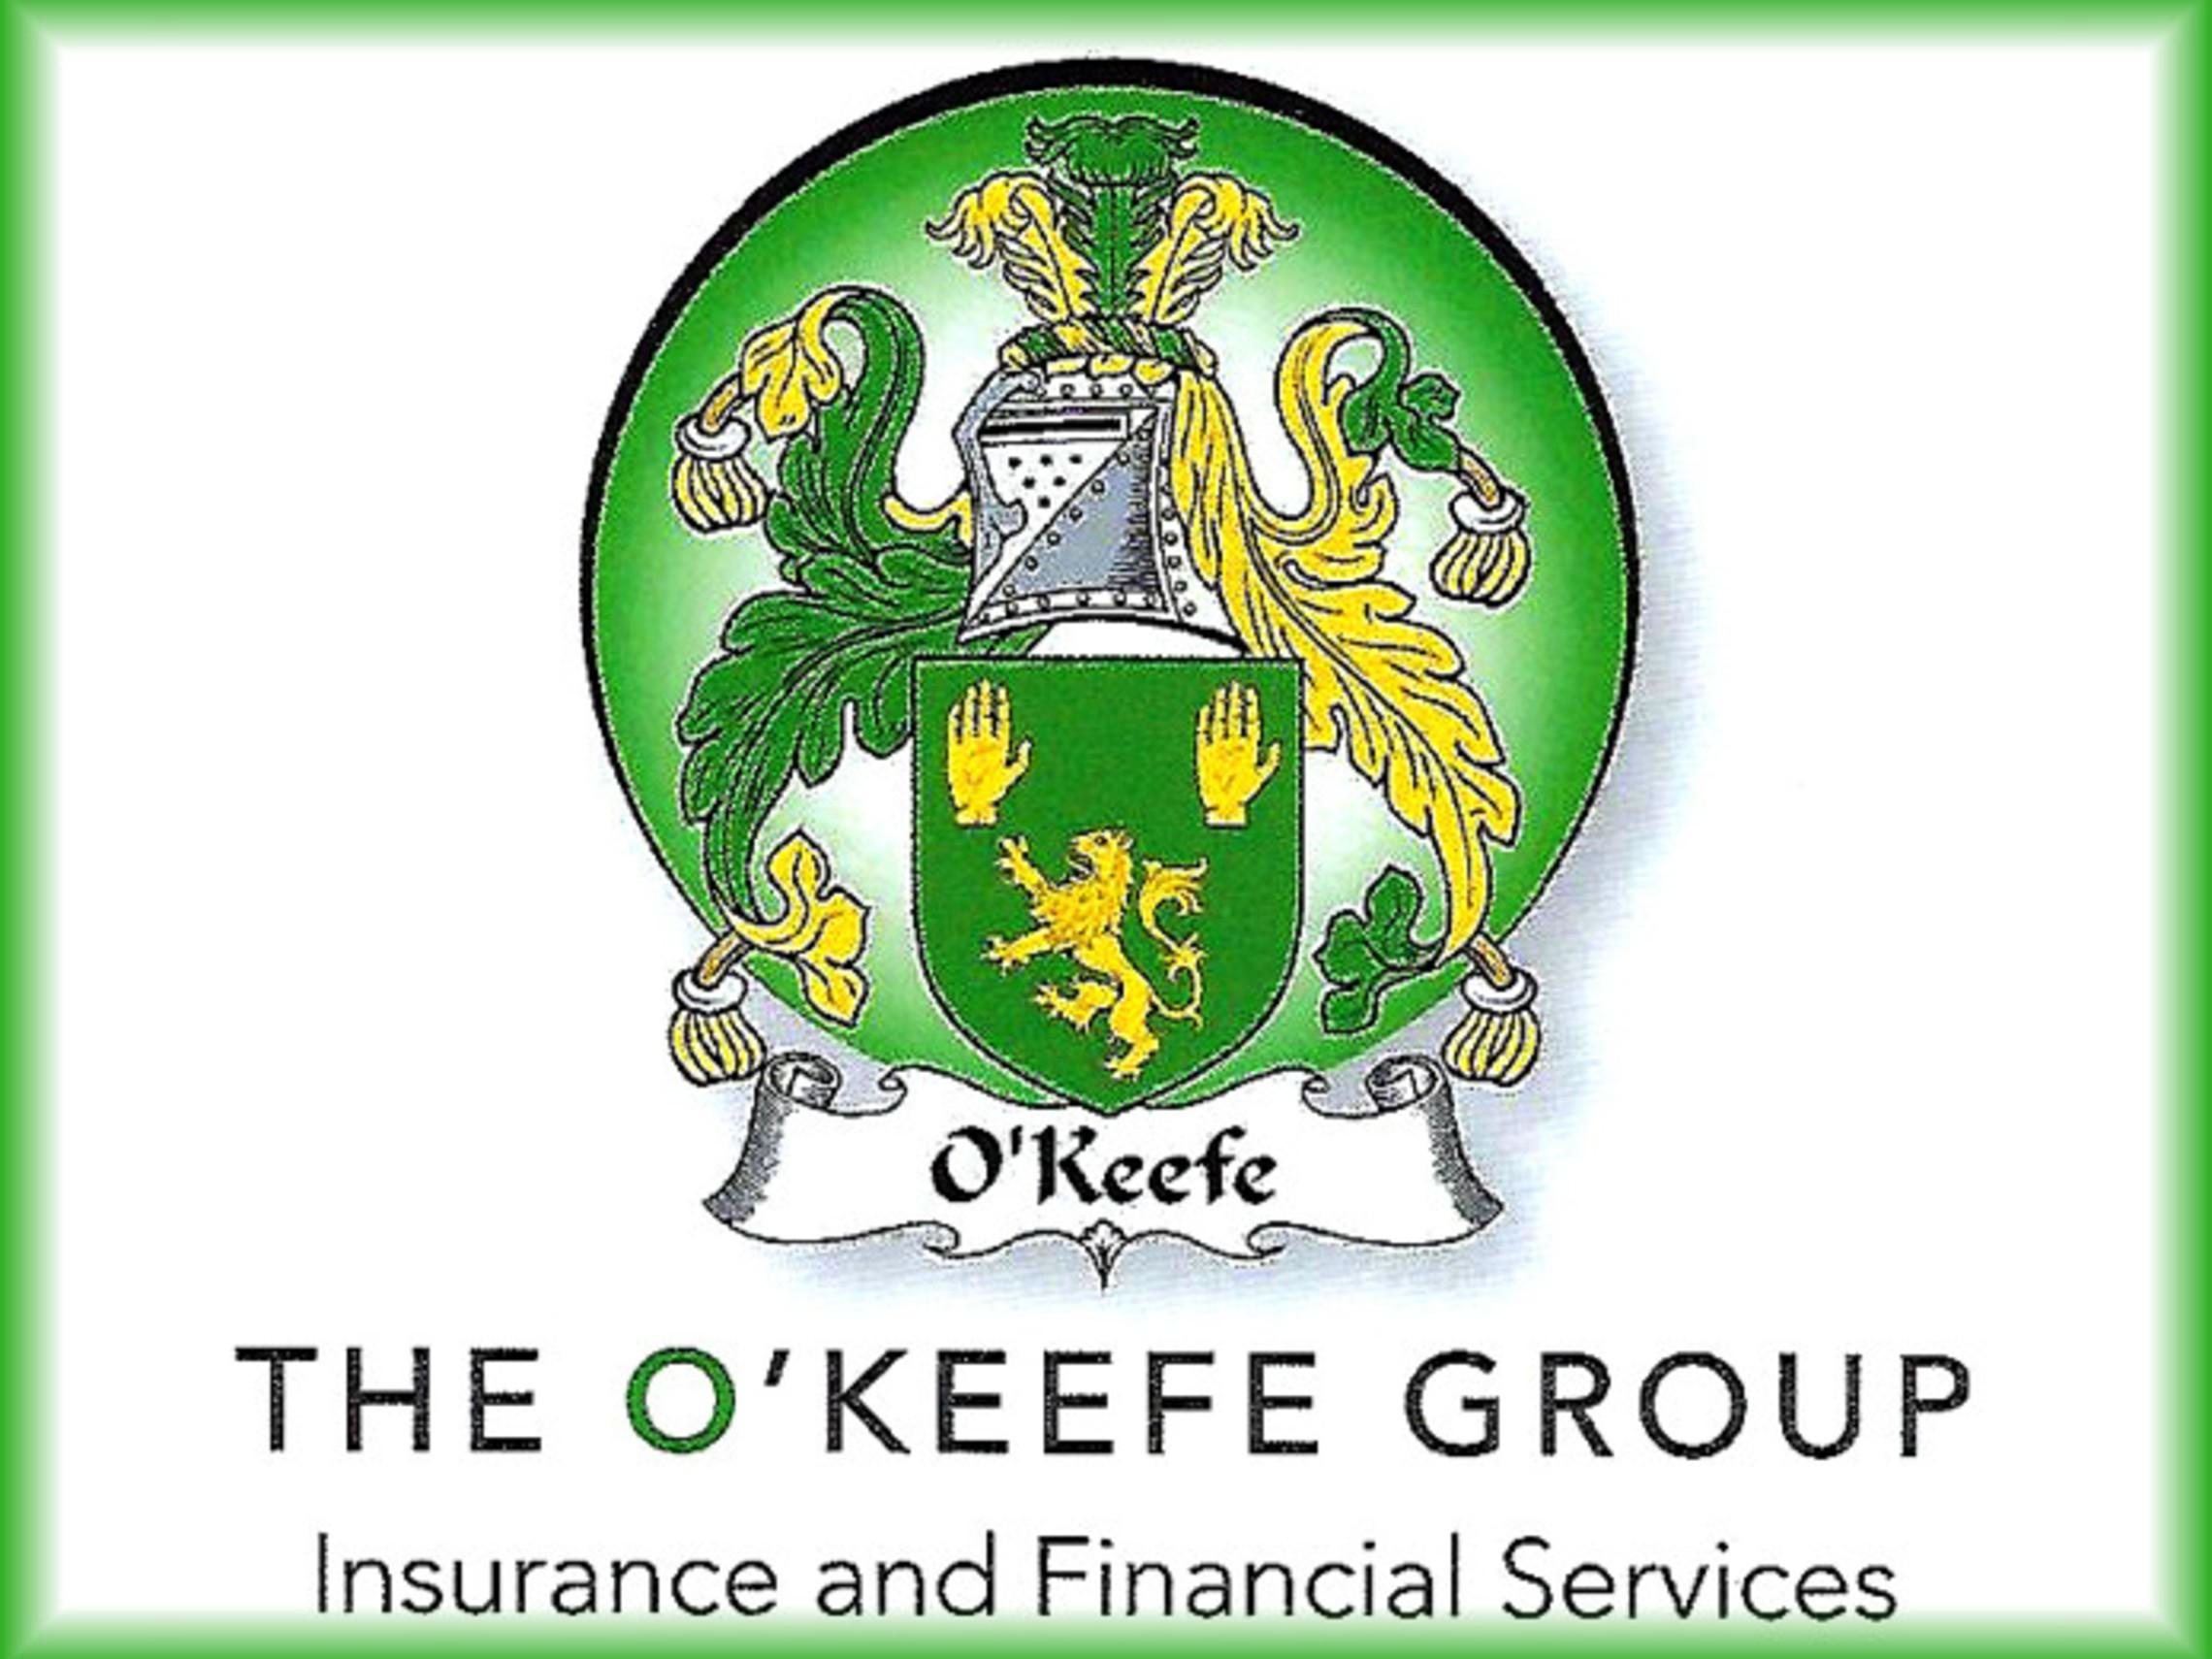 Okeefe Group